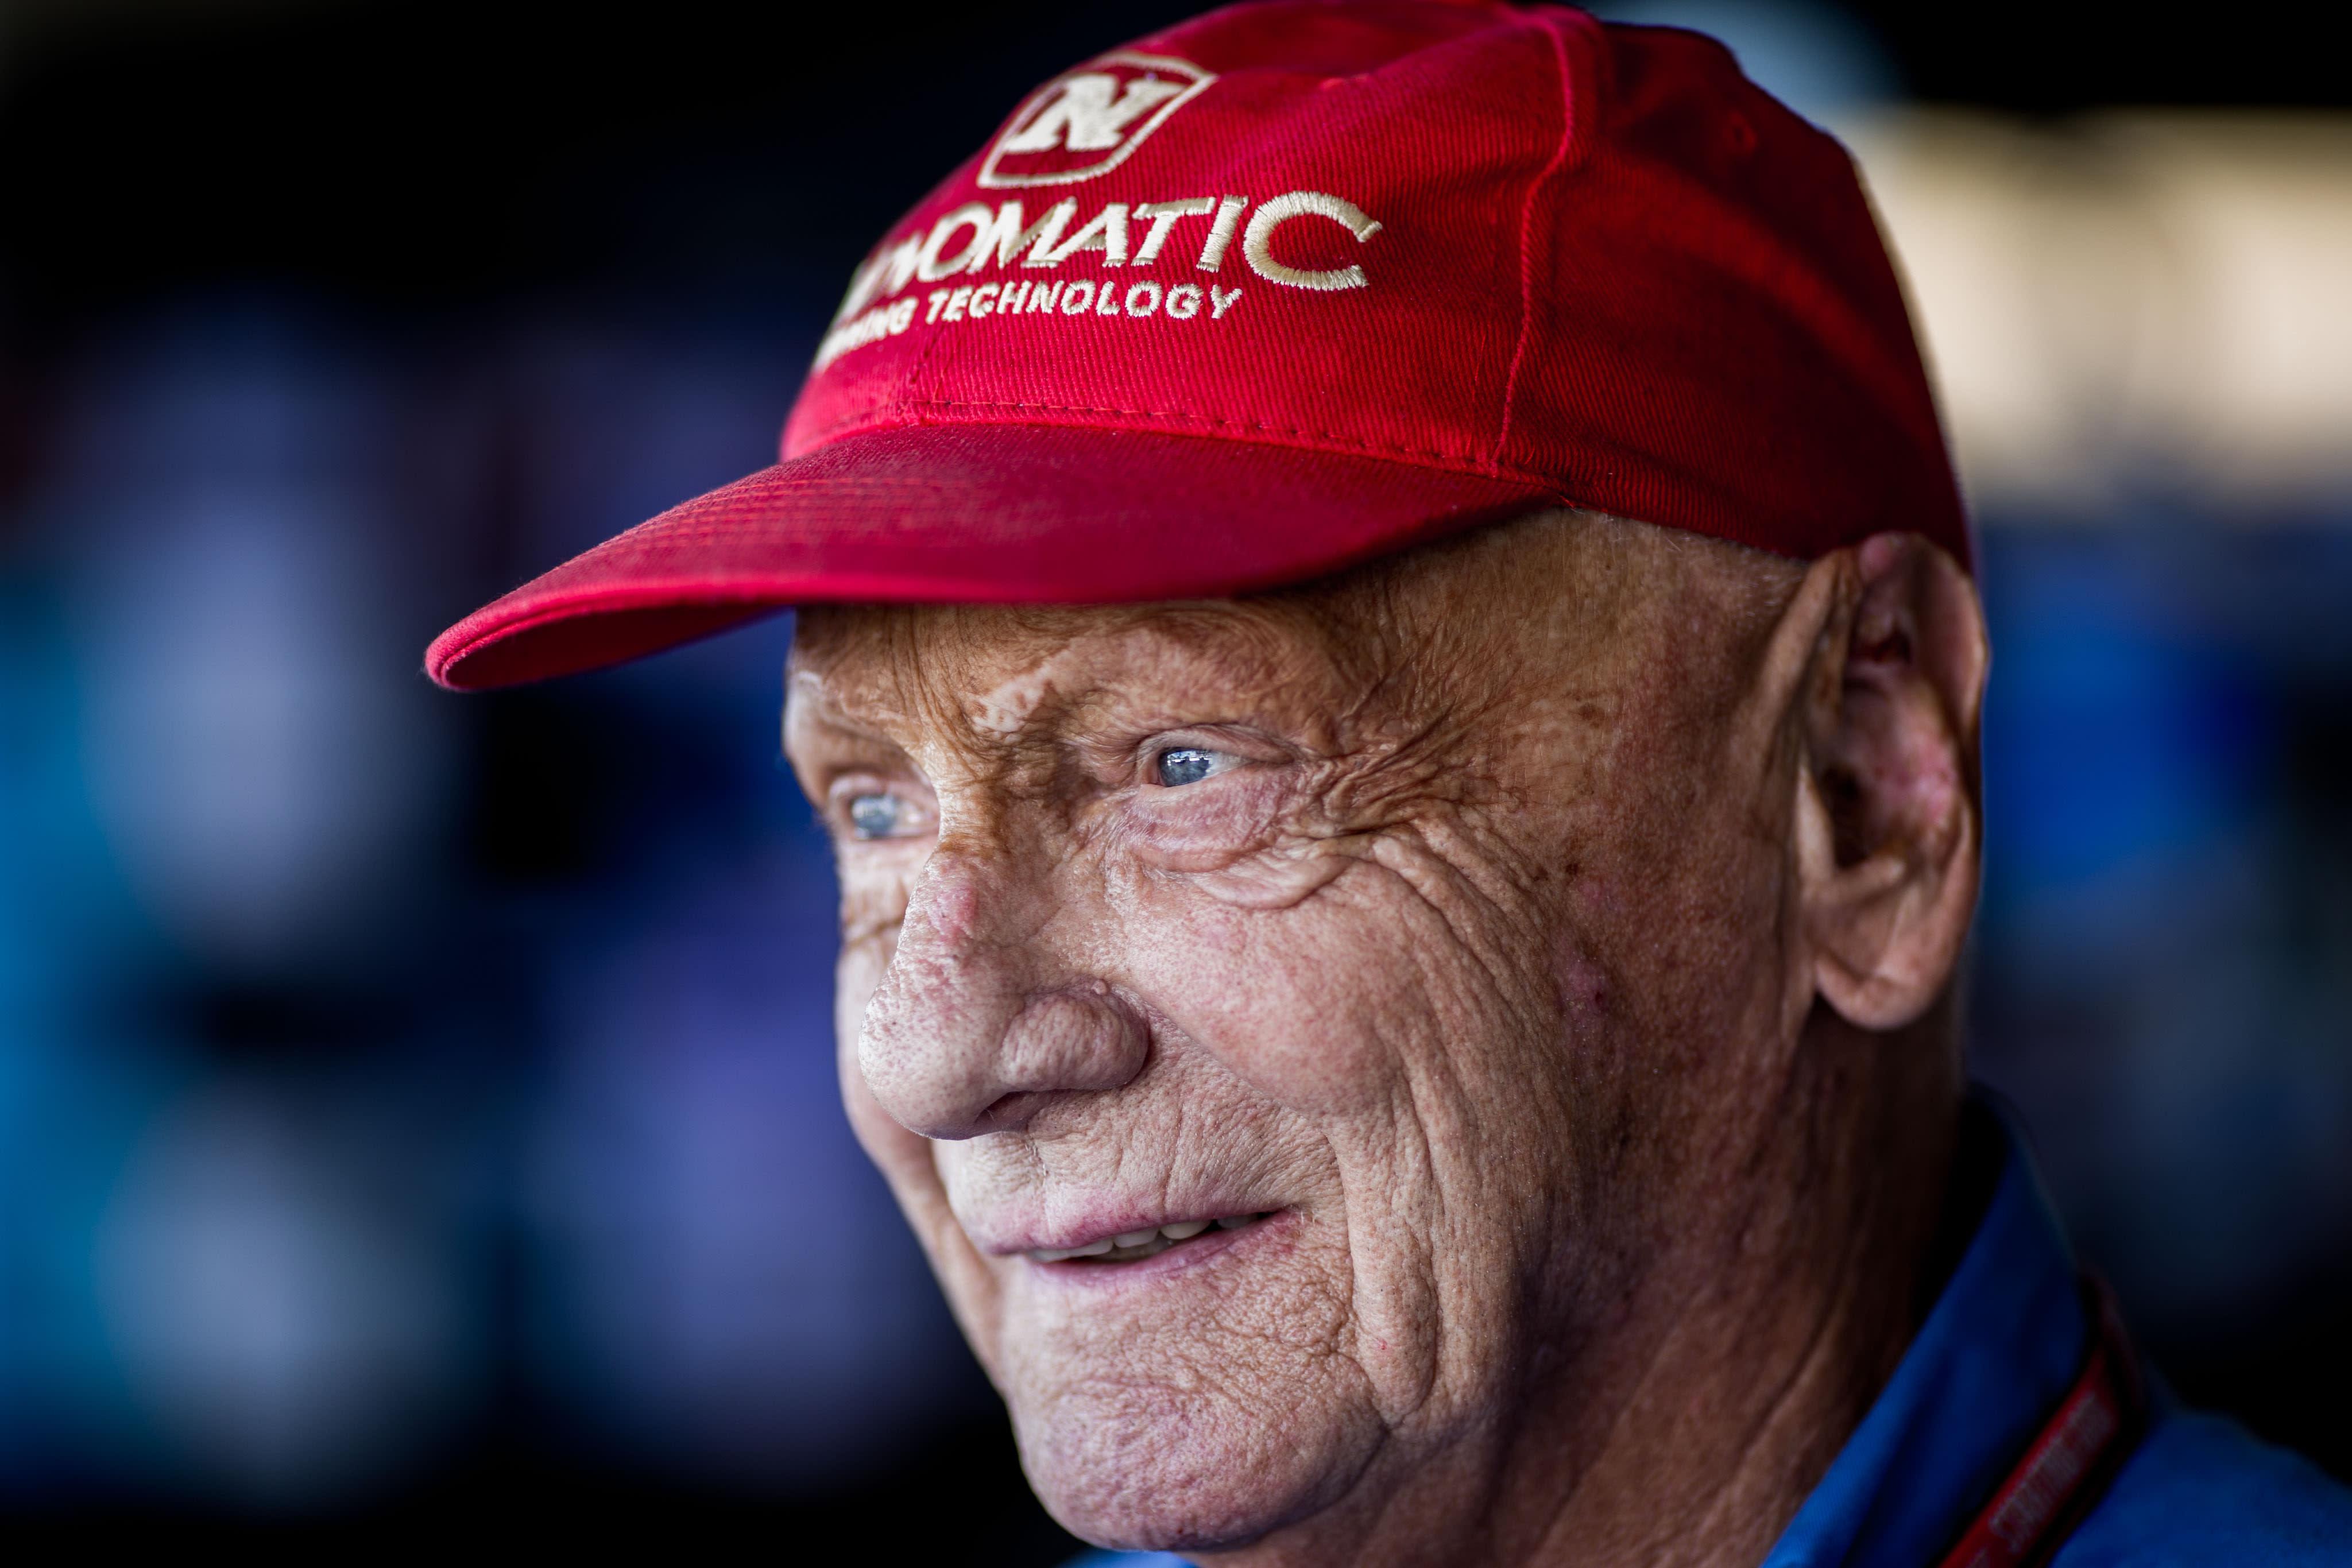 F1 great and aviation entrepreneur Niki Lauda dies at 70 thumbnail